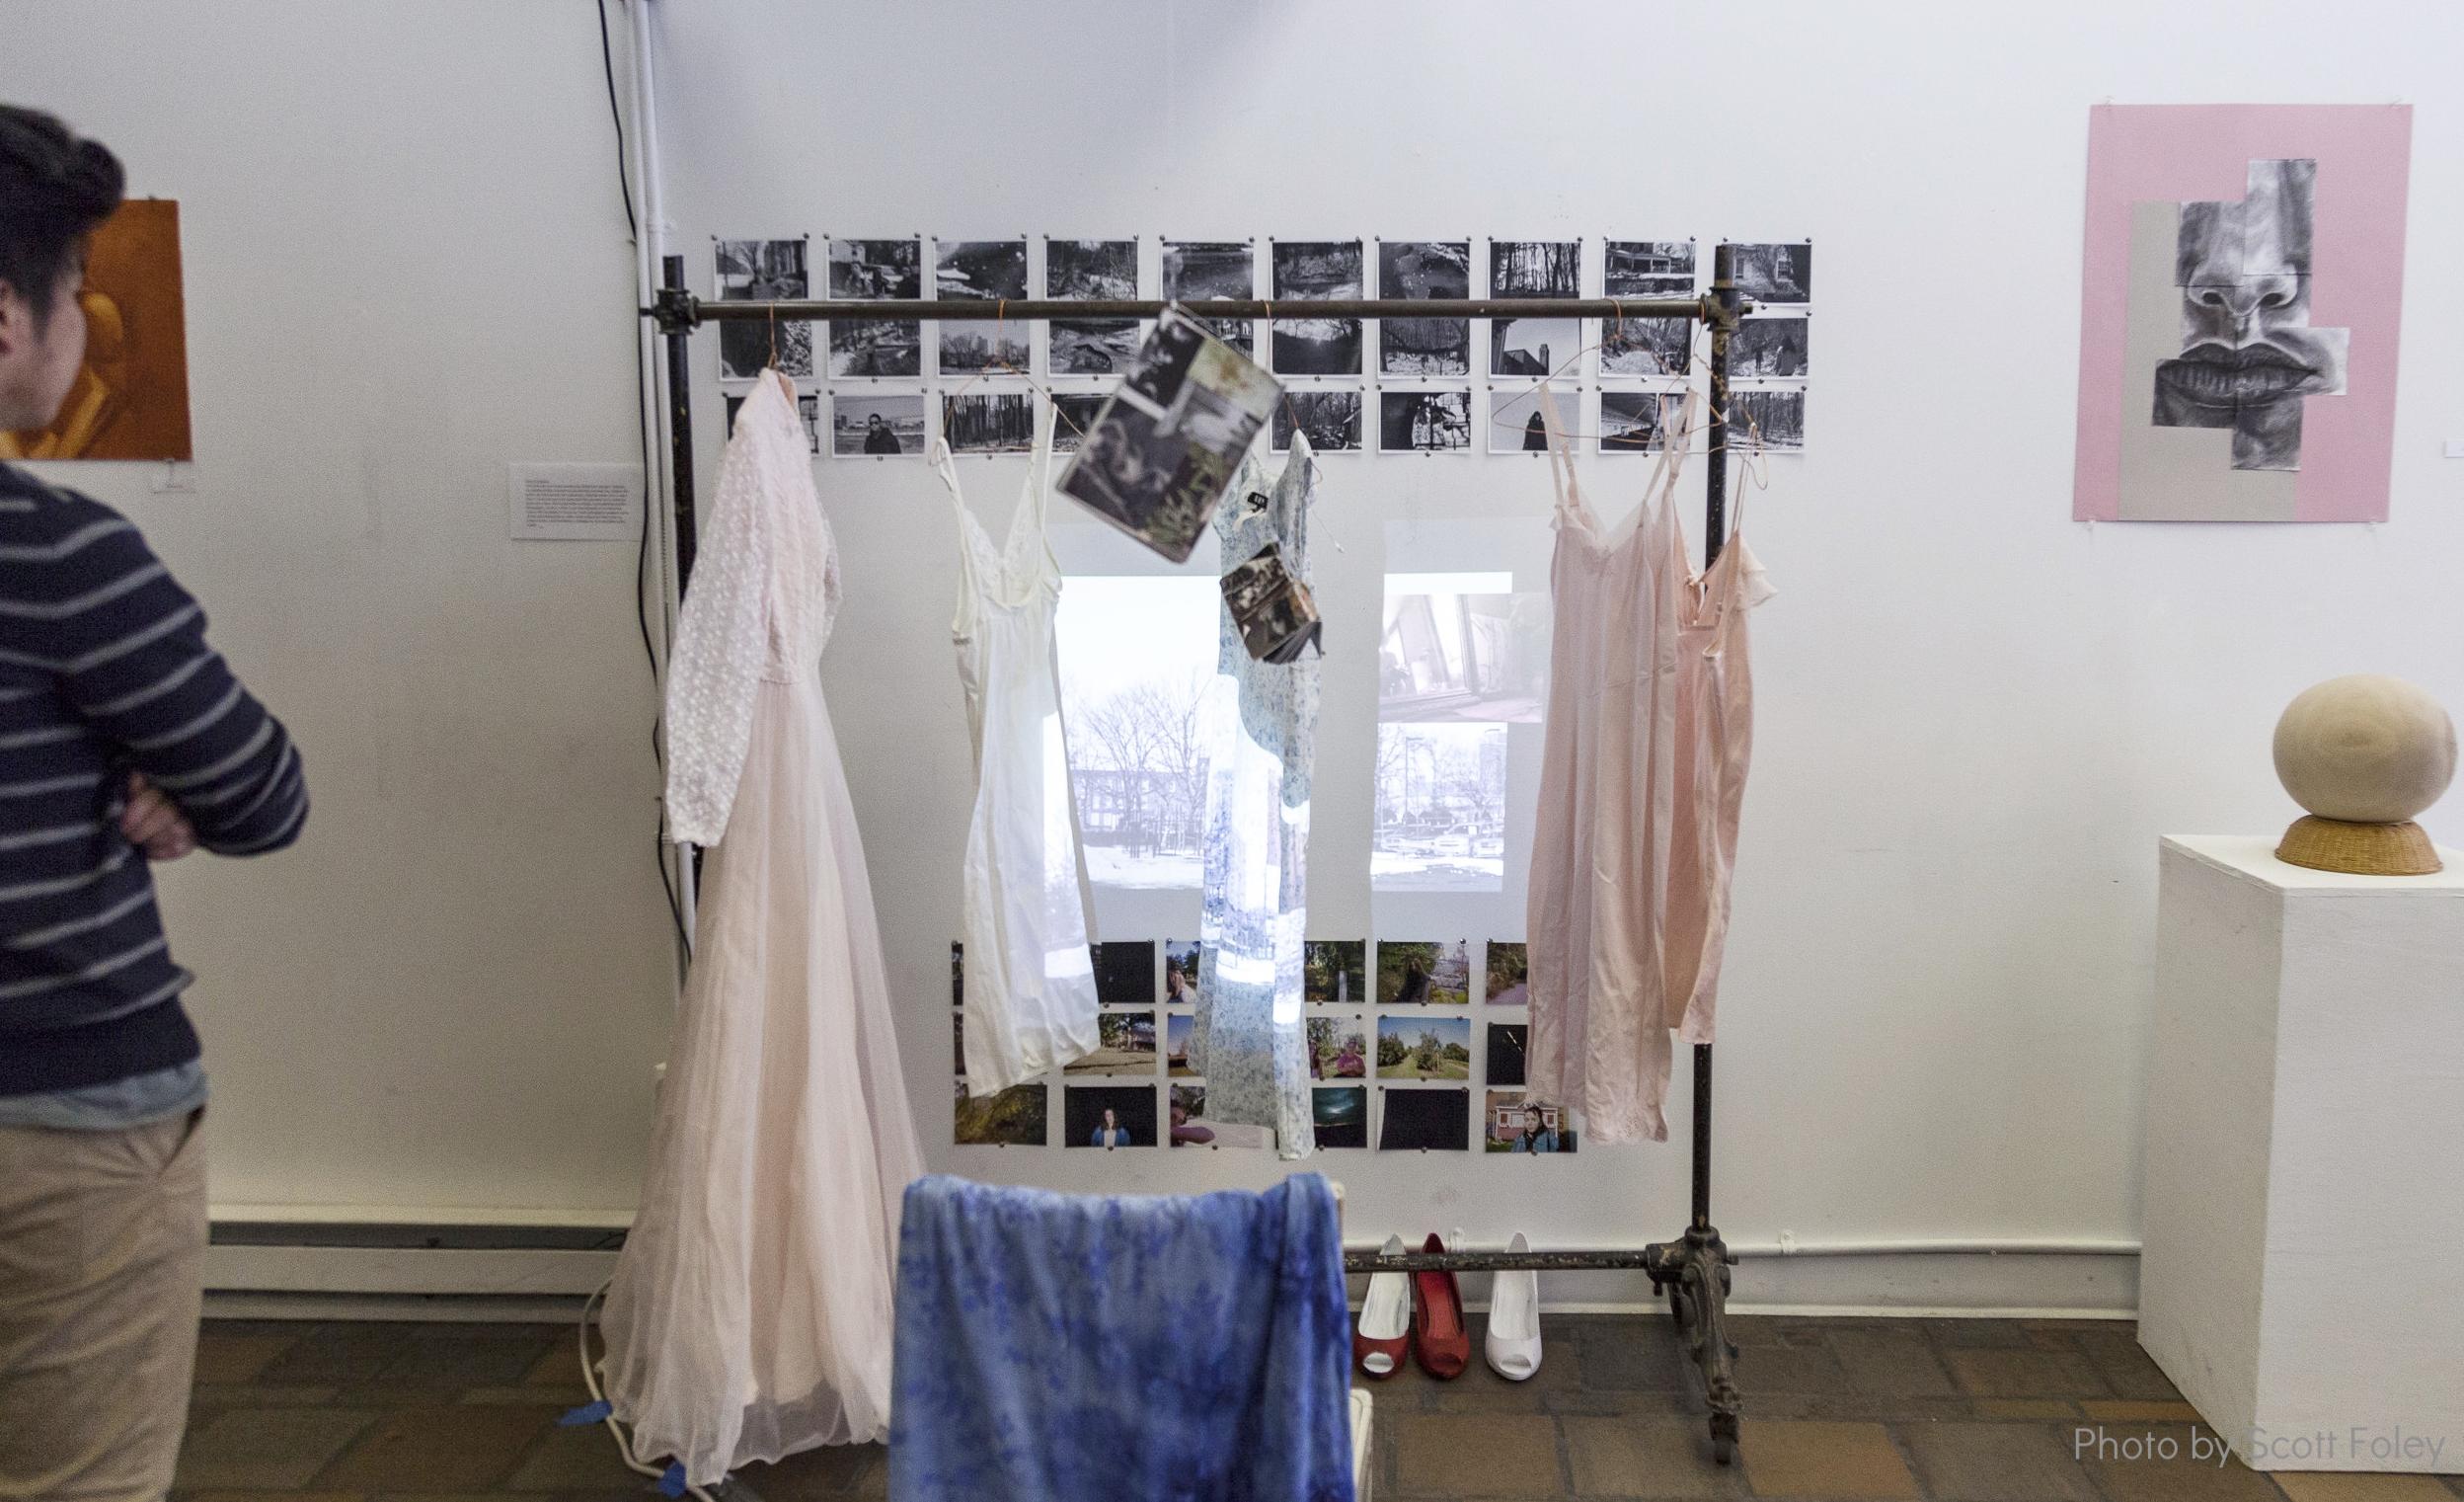 Emily Ecclestone's installation